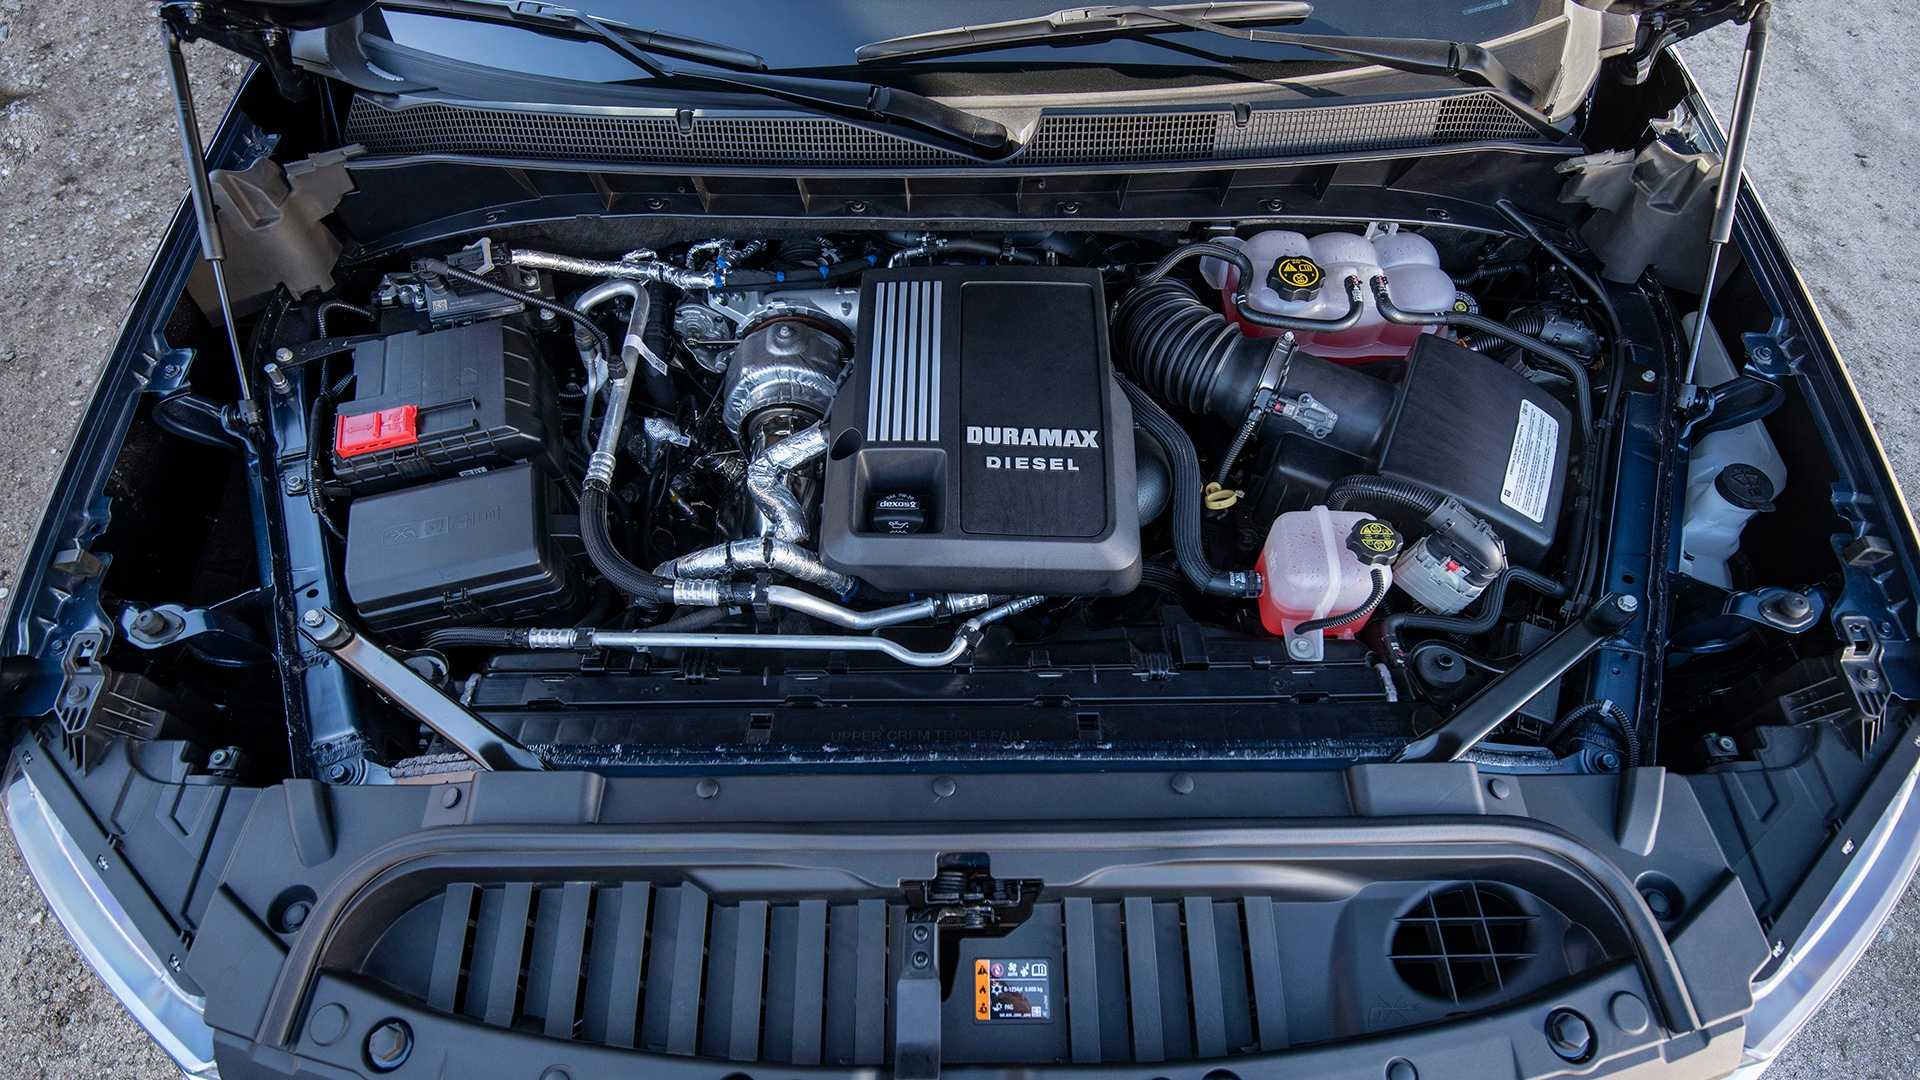 Best Wall Safes 2020 2020 Chevy Silverado 1500 Diesel Returns 33 MPG Highway: Report